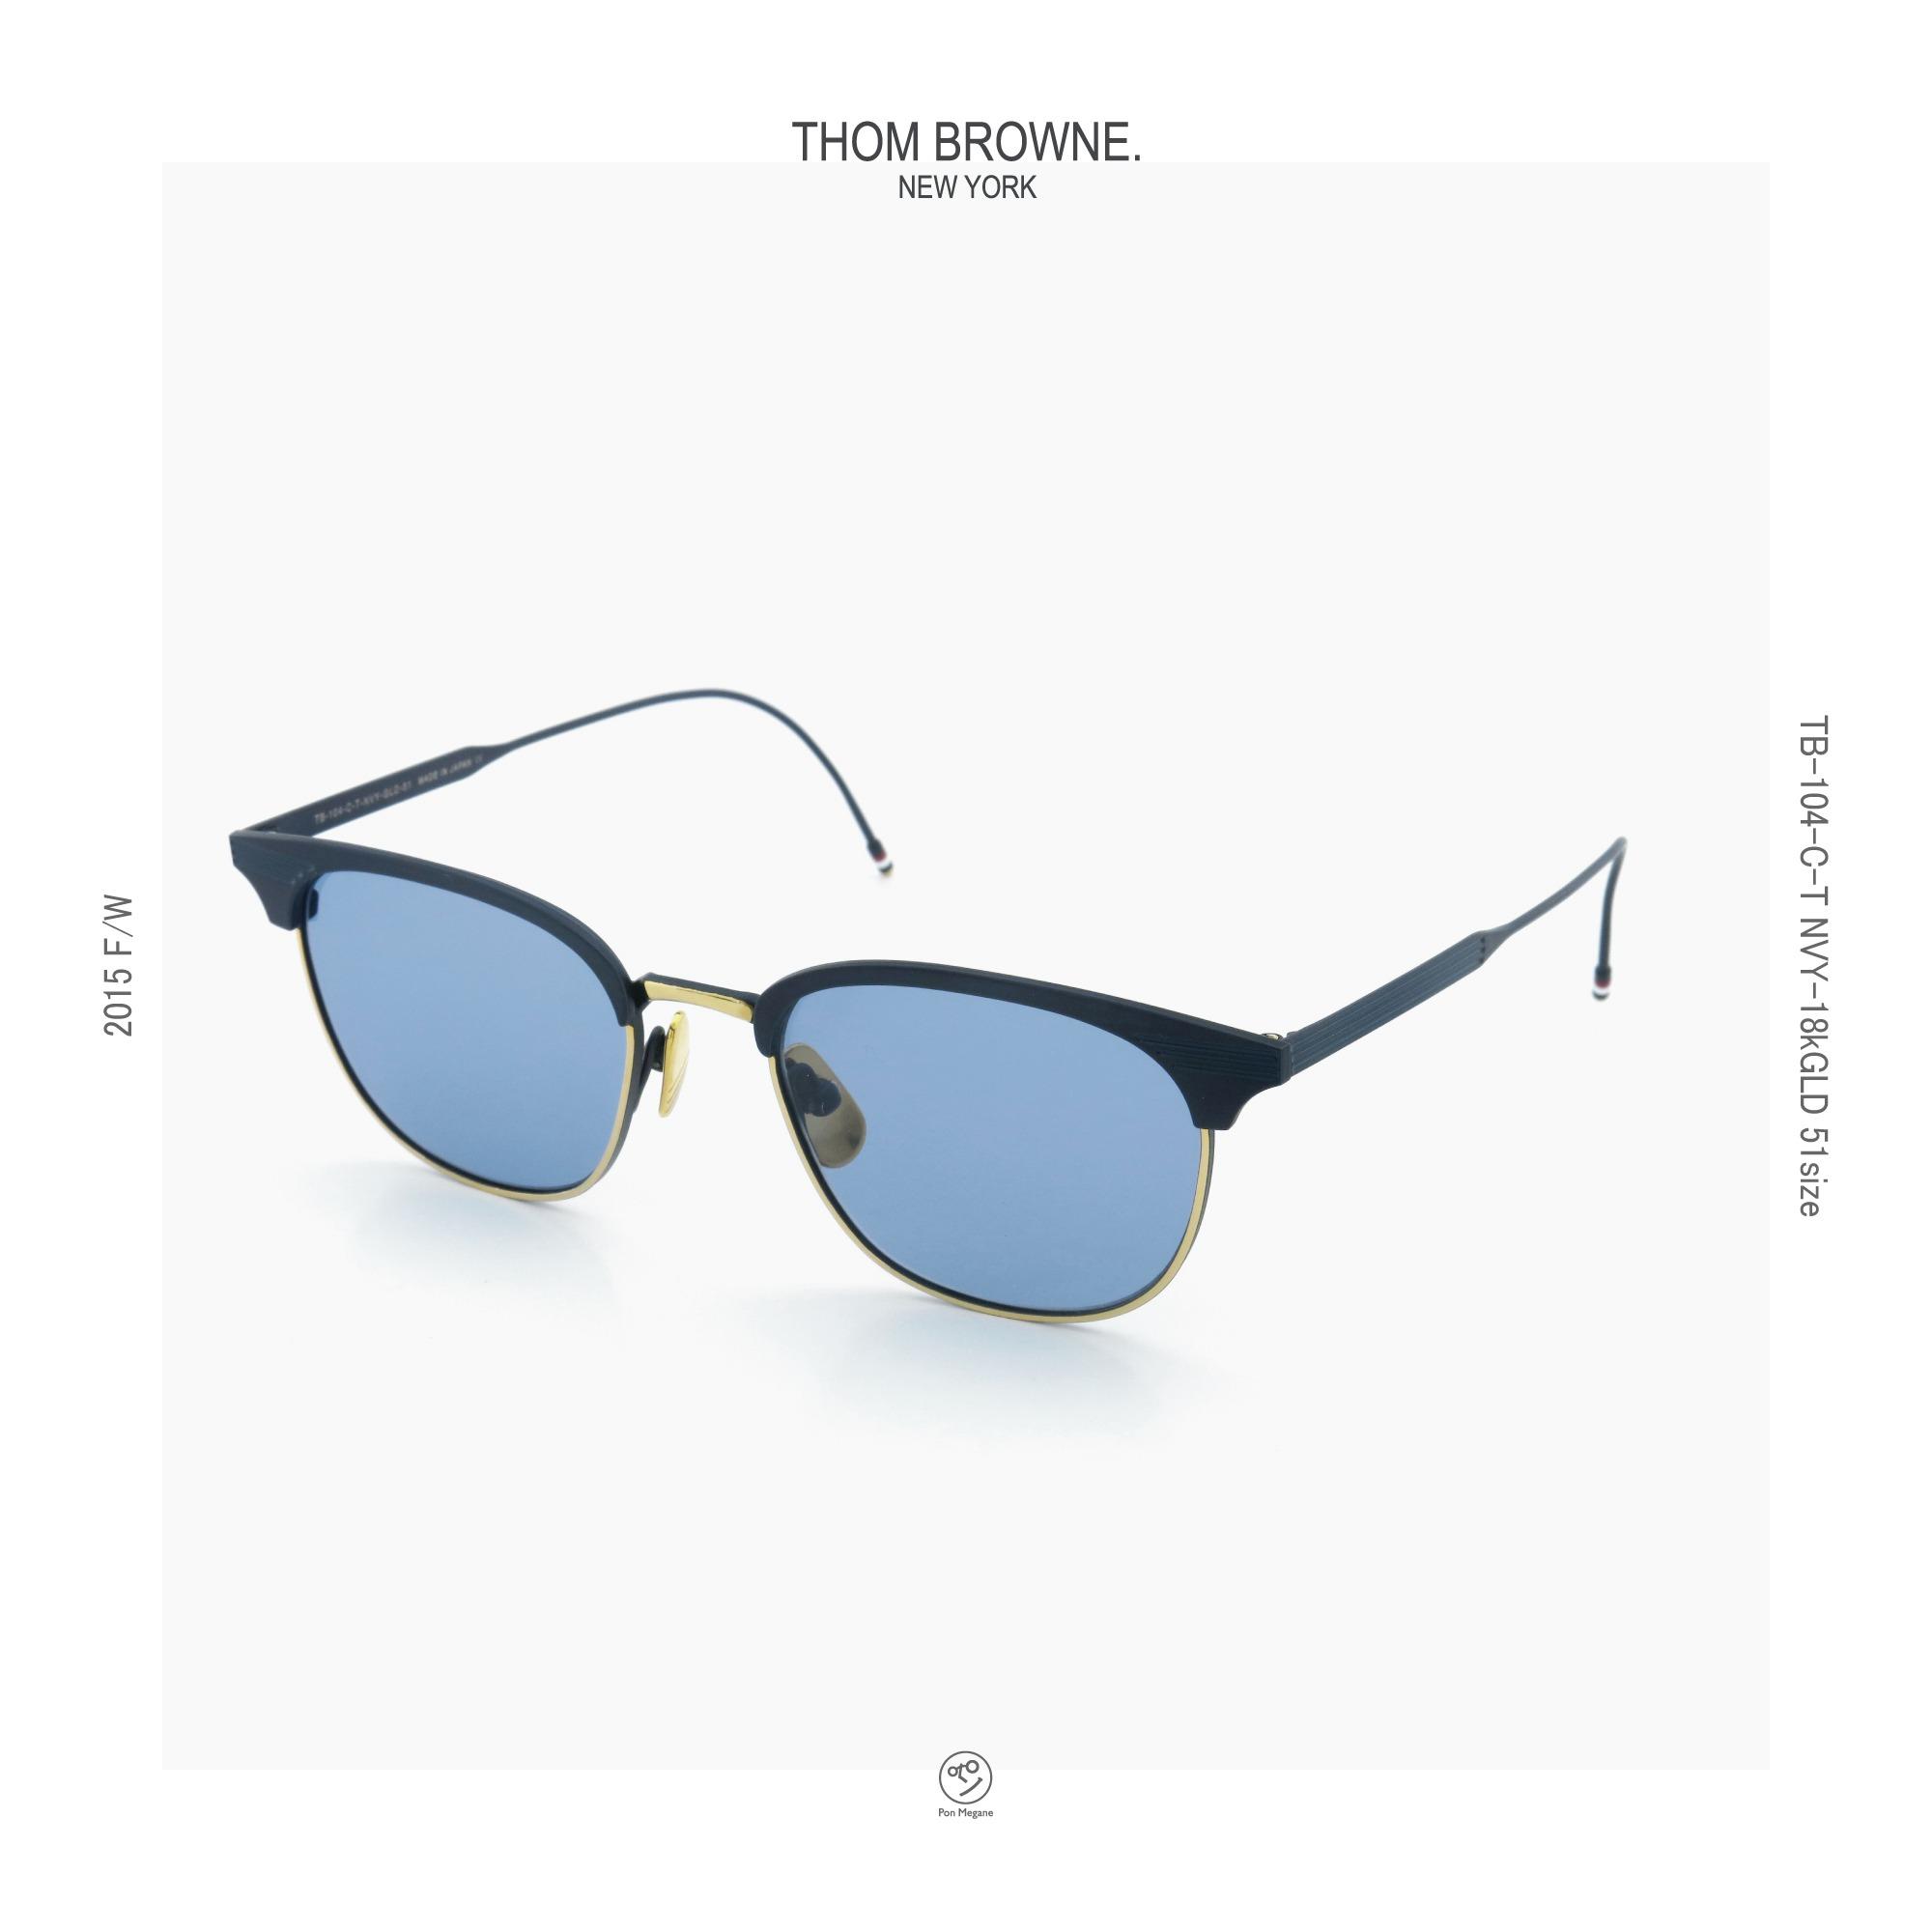 THOM-BROWNE-TB-104-C-T-NVY-18kGLD-51-DB-insta